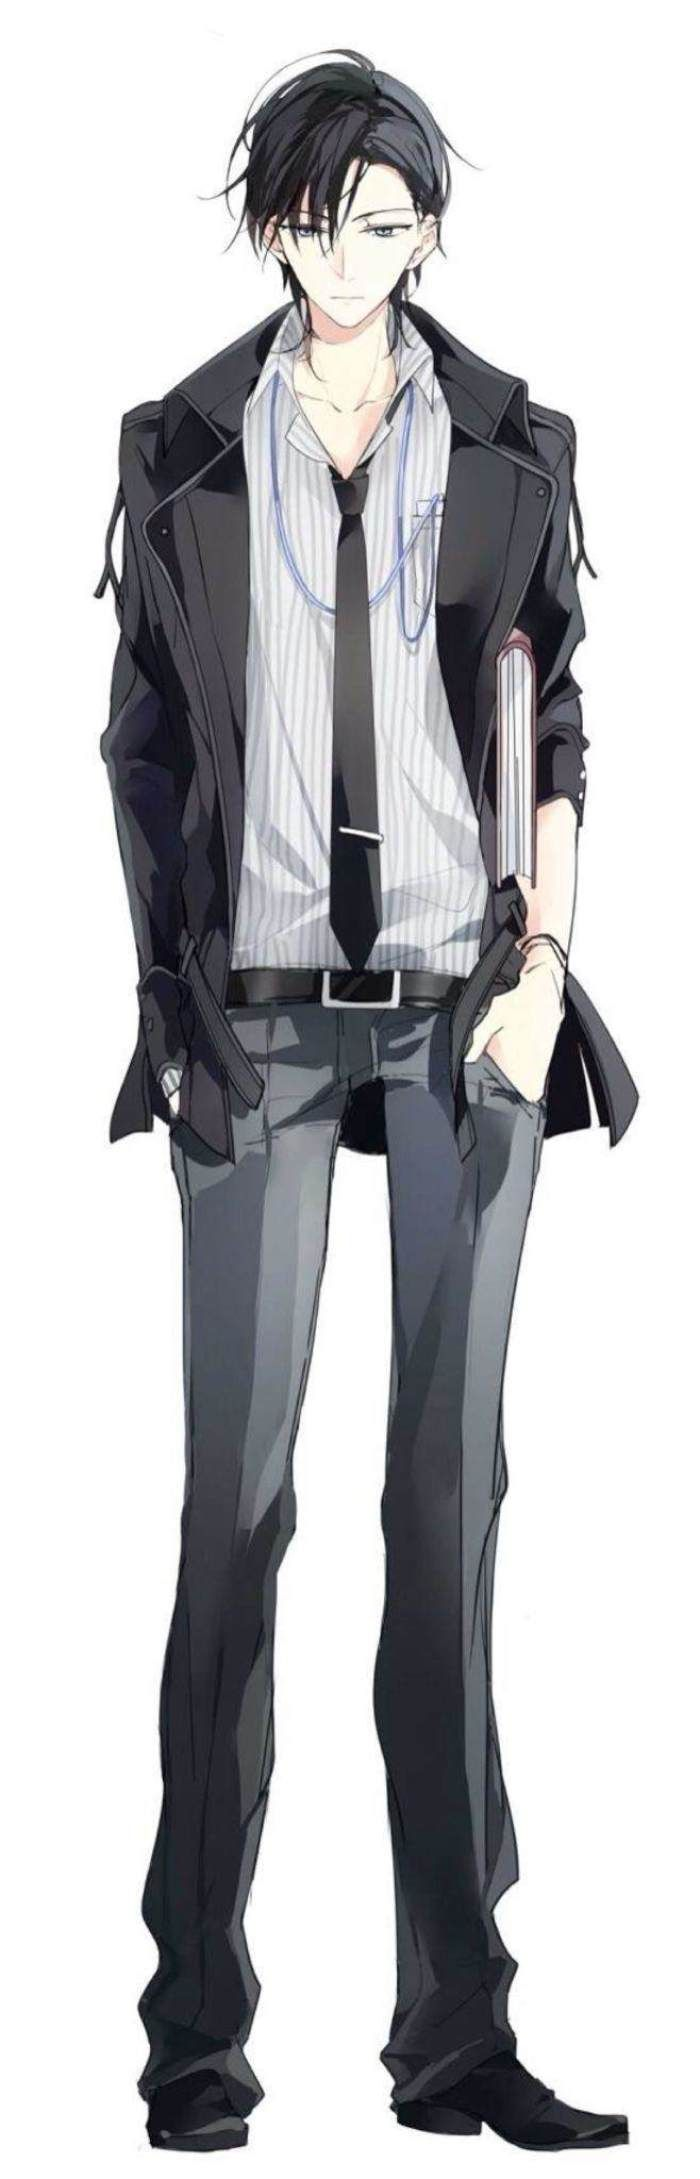 Pin By Hoshi Inoue On Anime Boy Full Body Cool Anime Guys Hot Anime Boy Anime